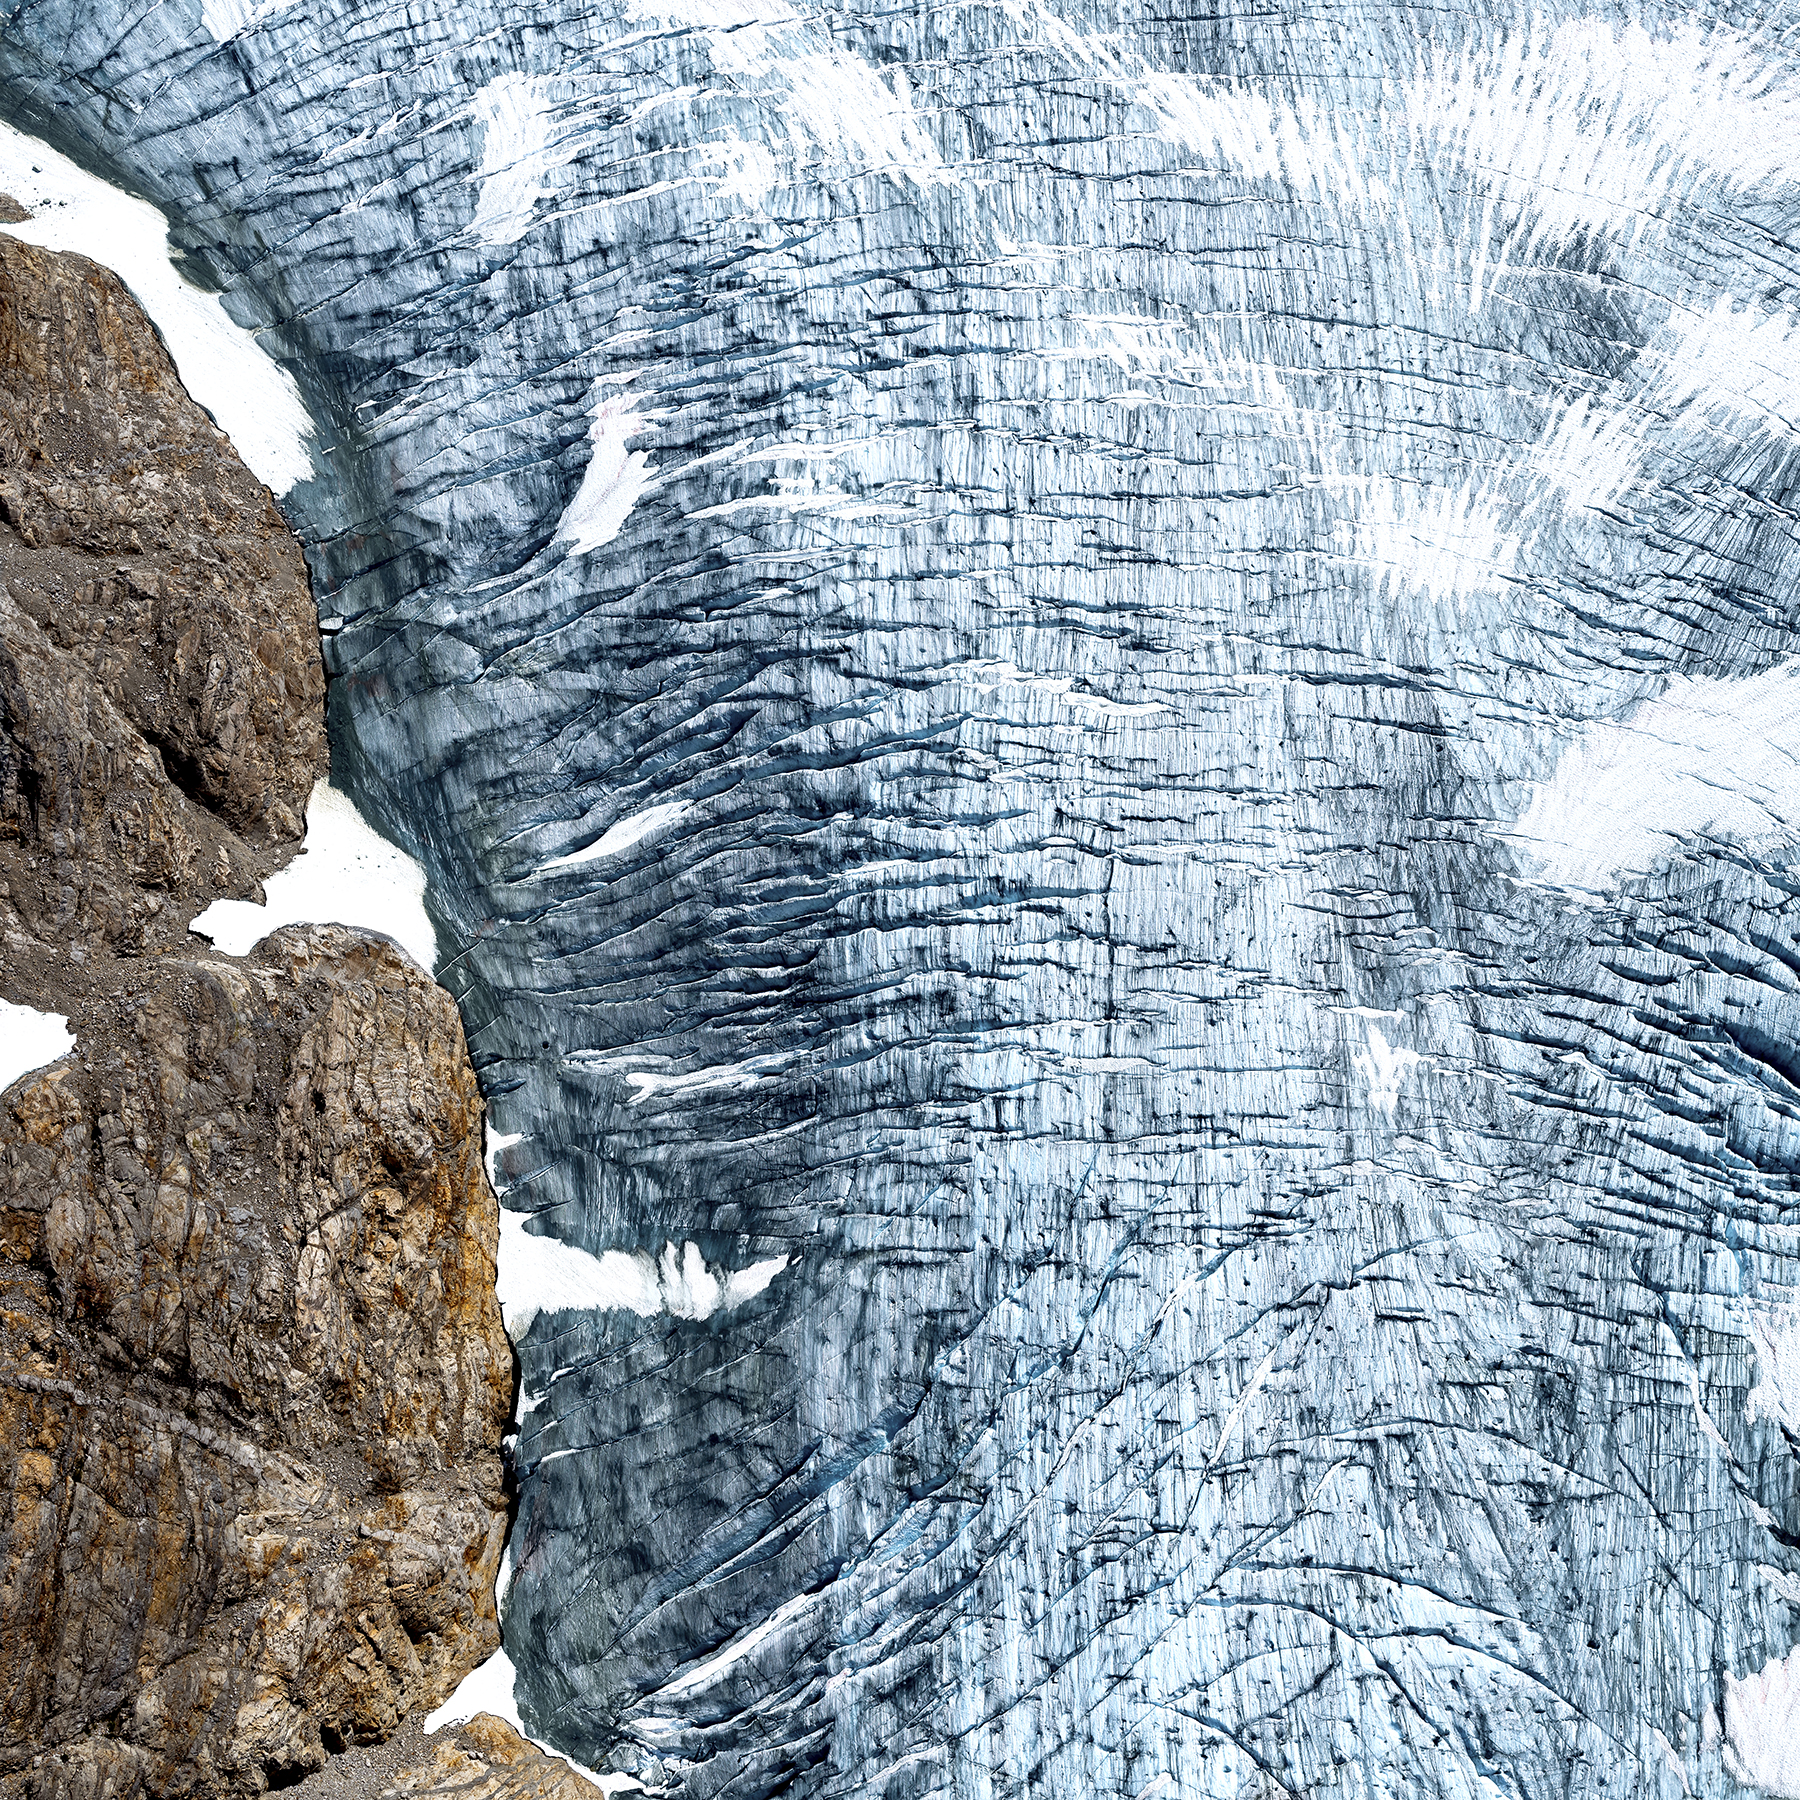 Icefield Study #21 | Mammoth (2018)